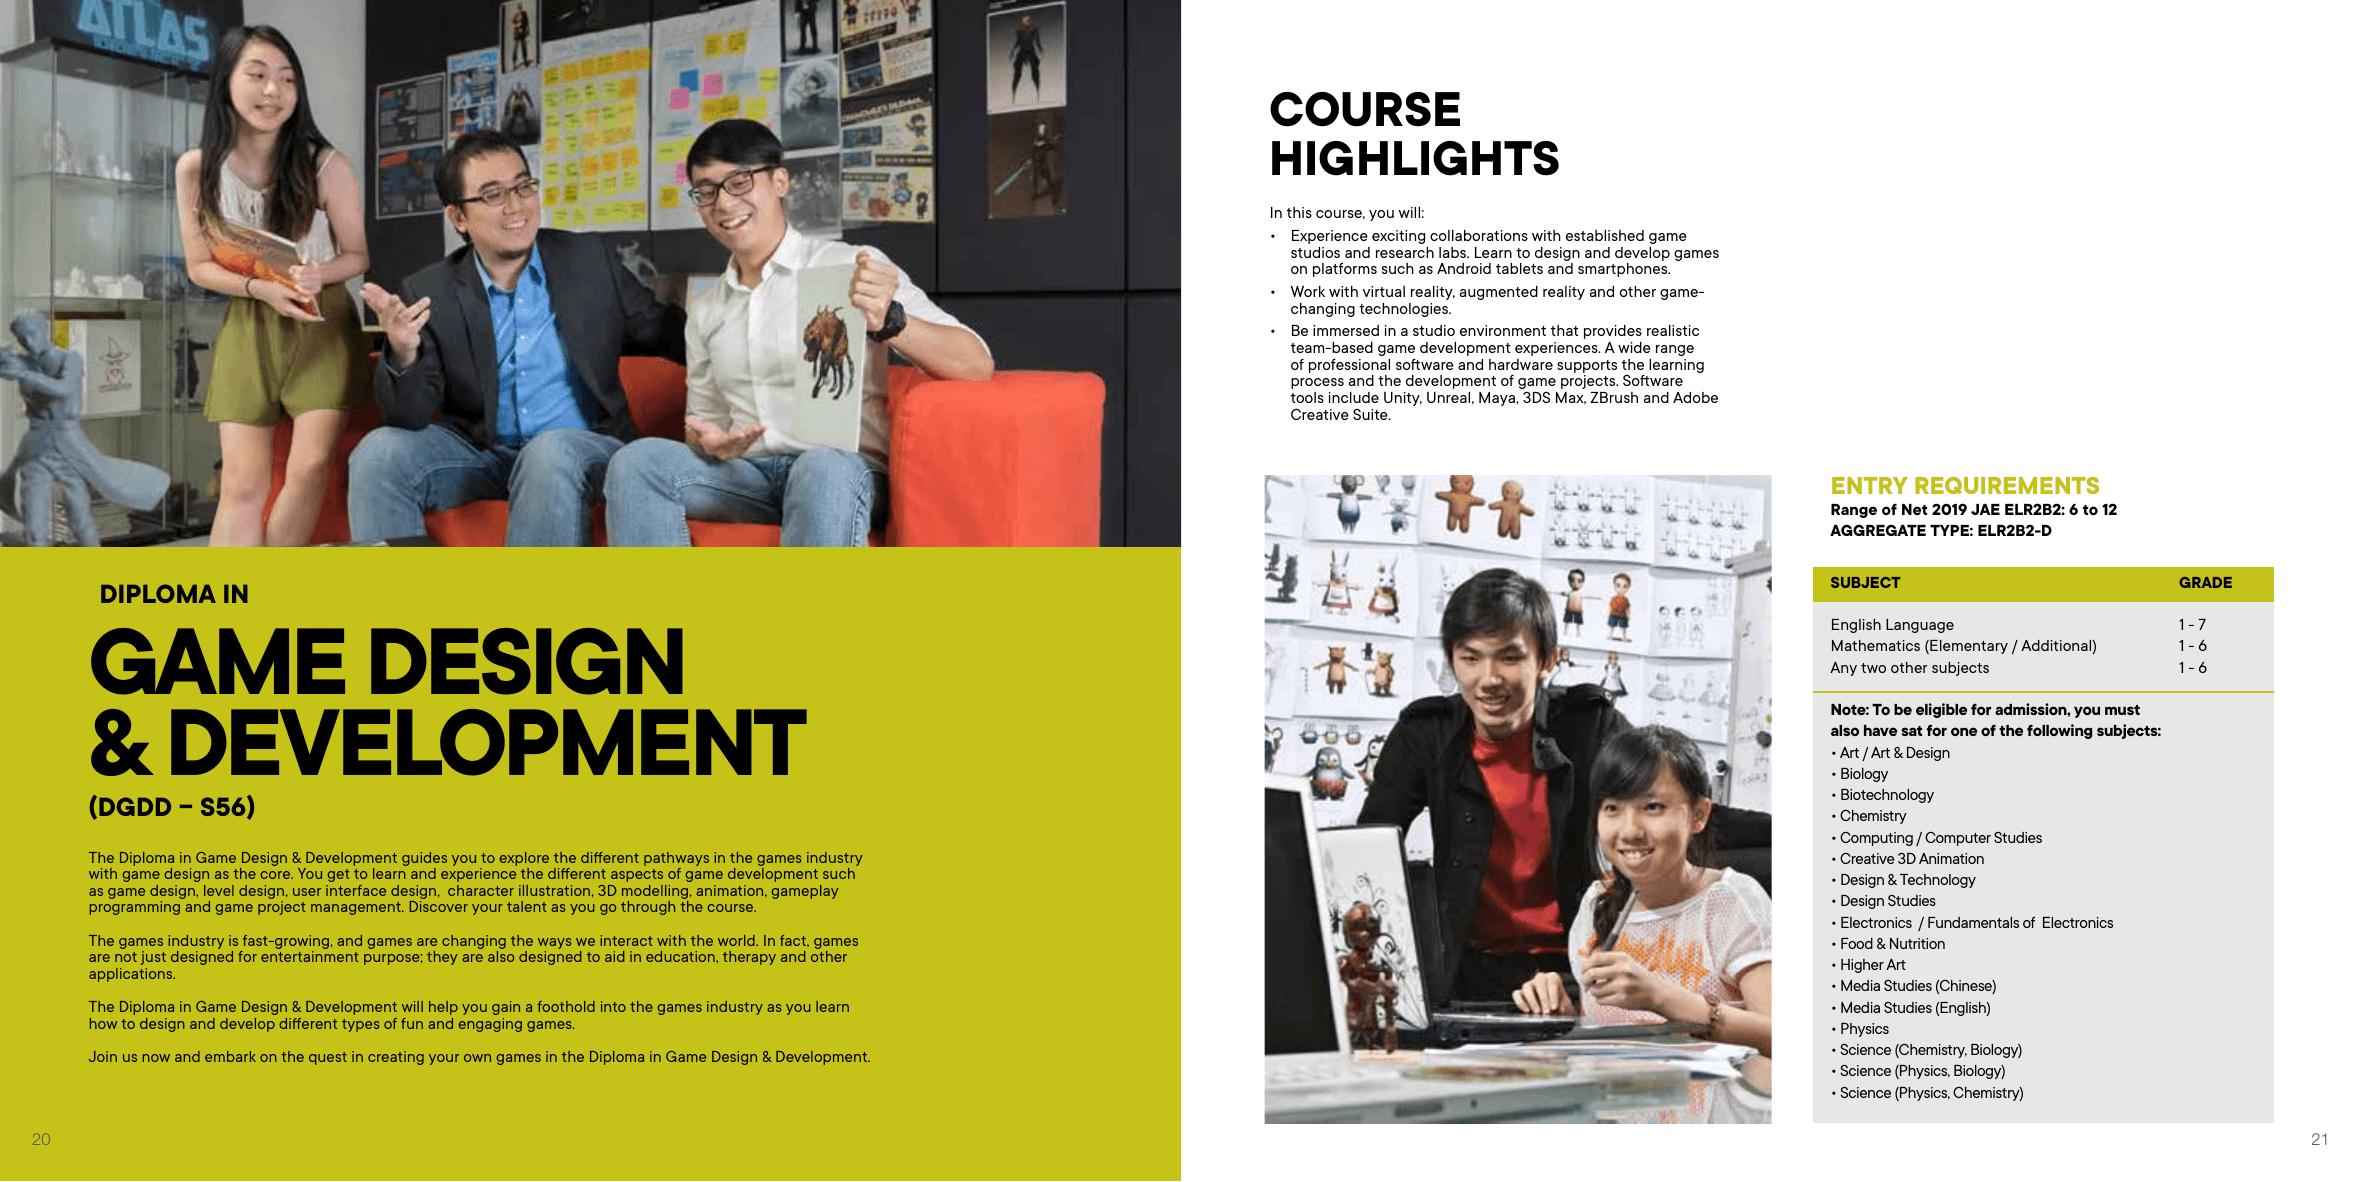 Media Arts & Design 2020 11